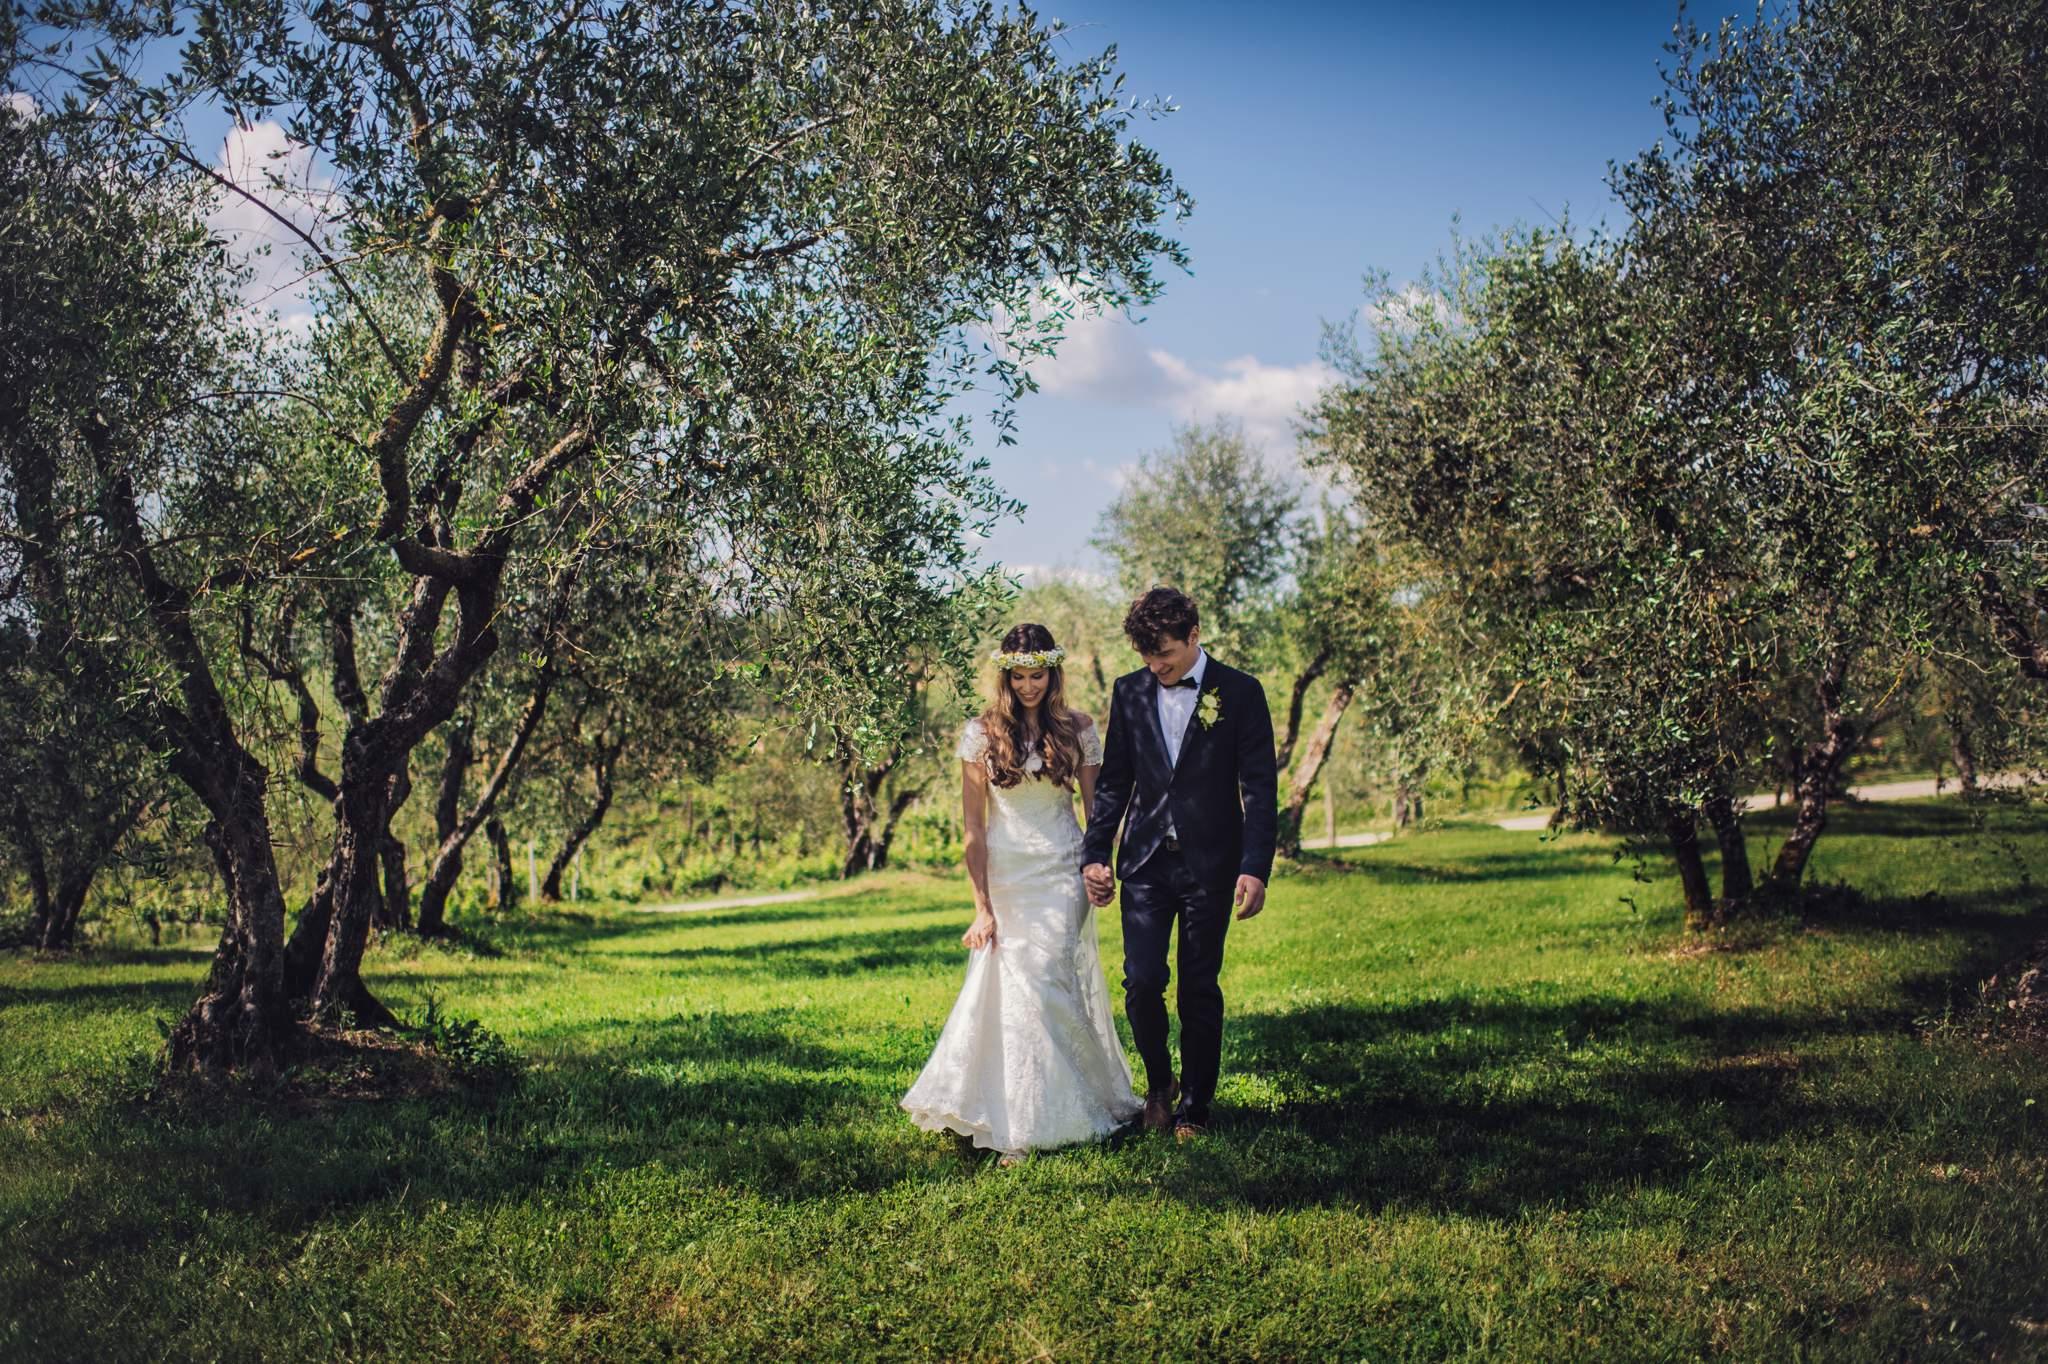 27wedding-photographer-tuscany-siena